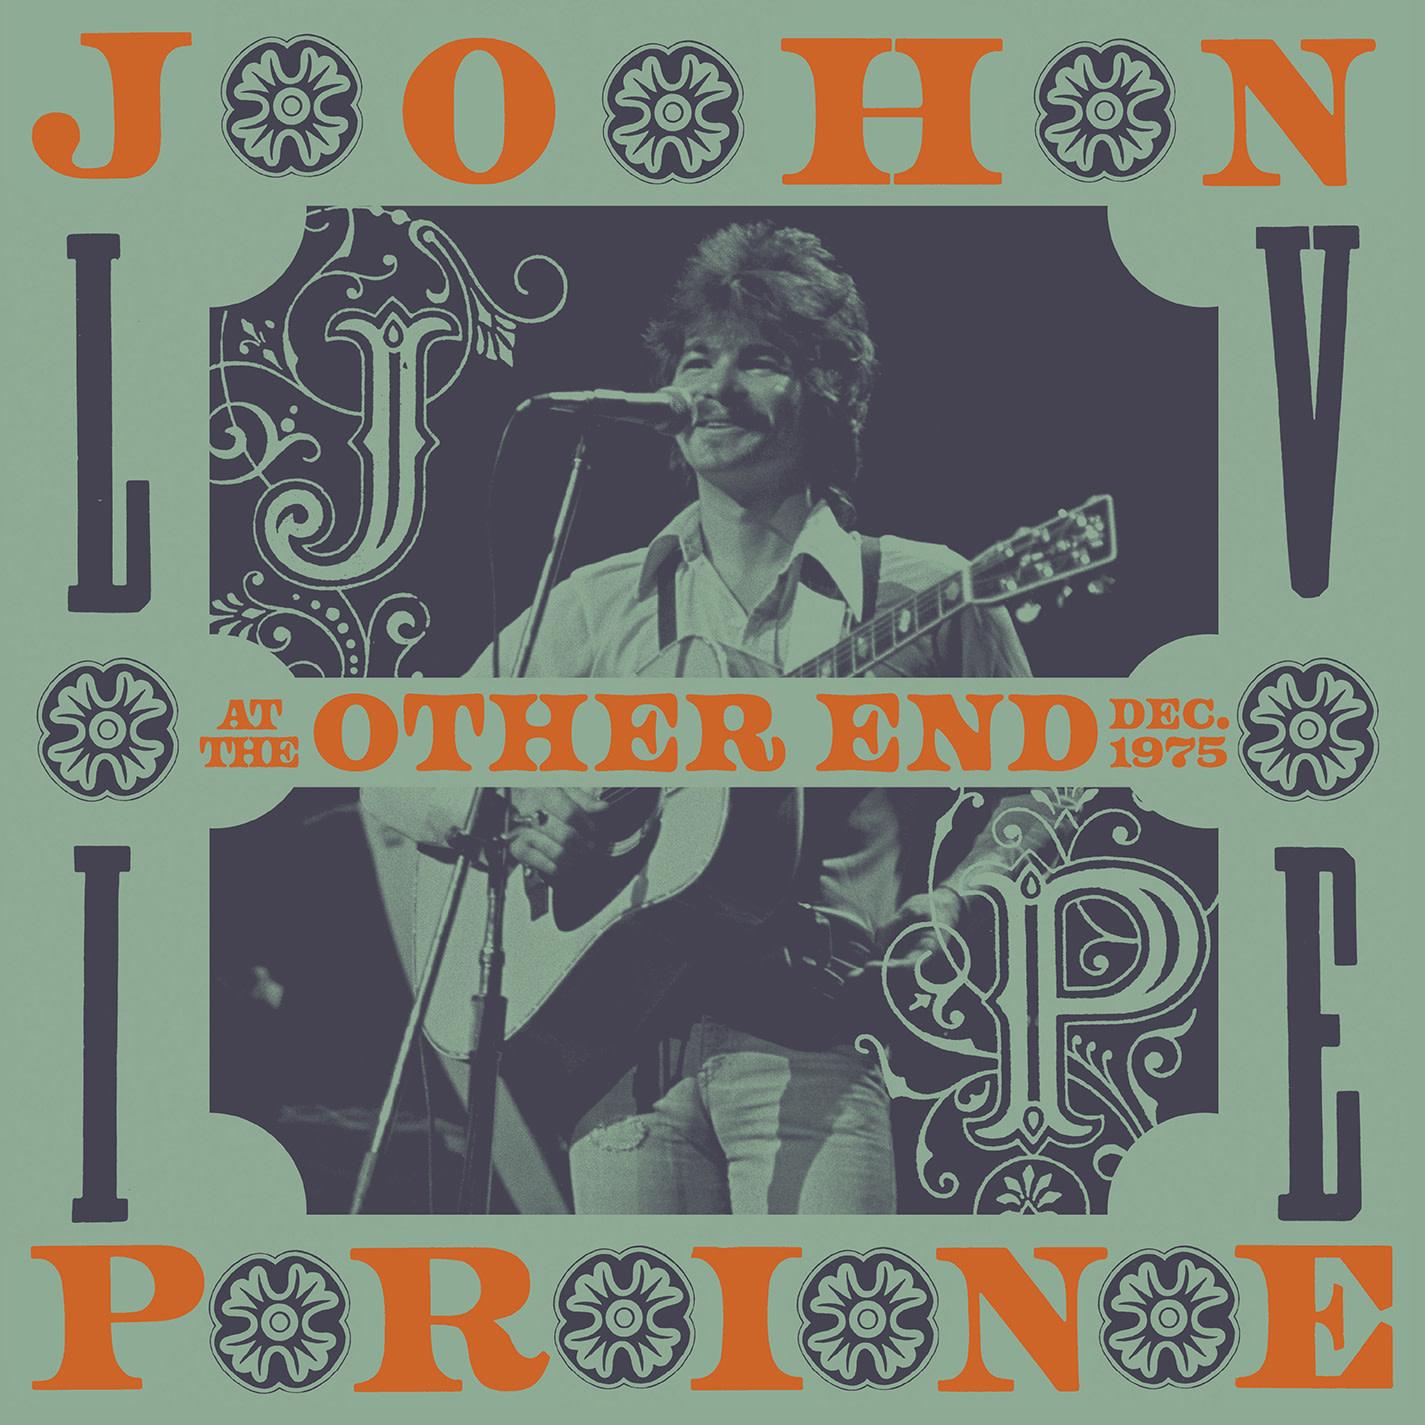 John Prine - Live At The Other End, December 1975